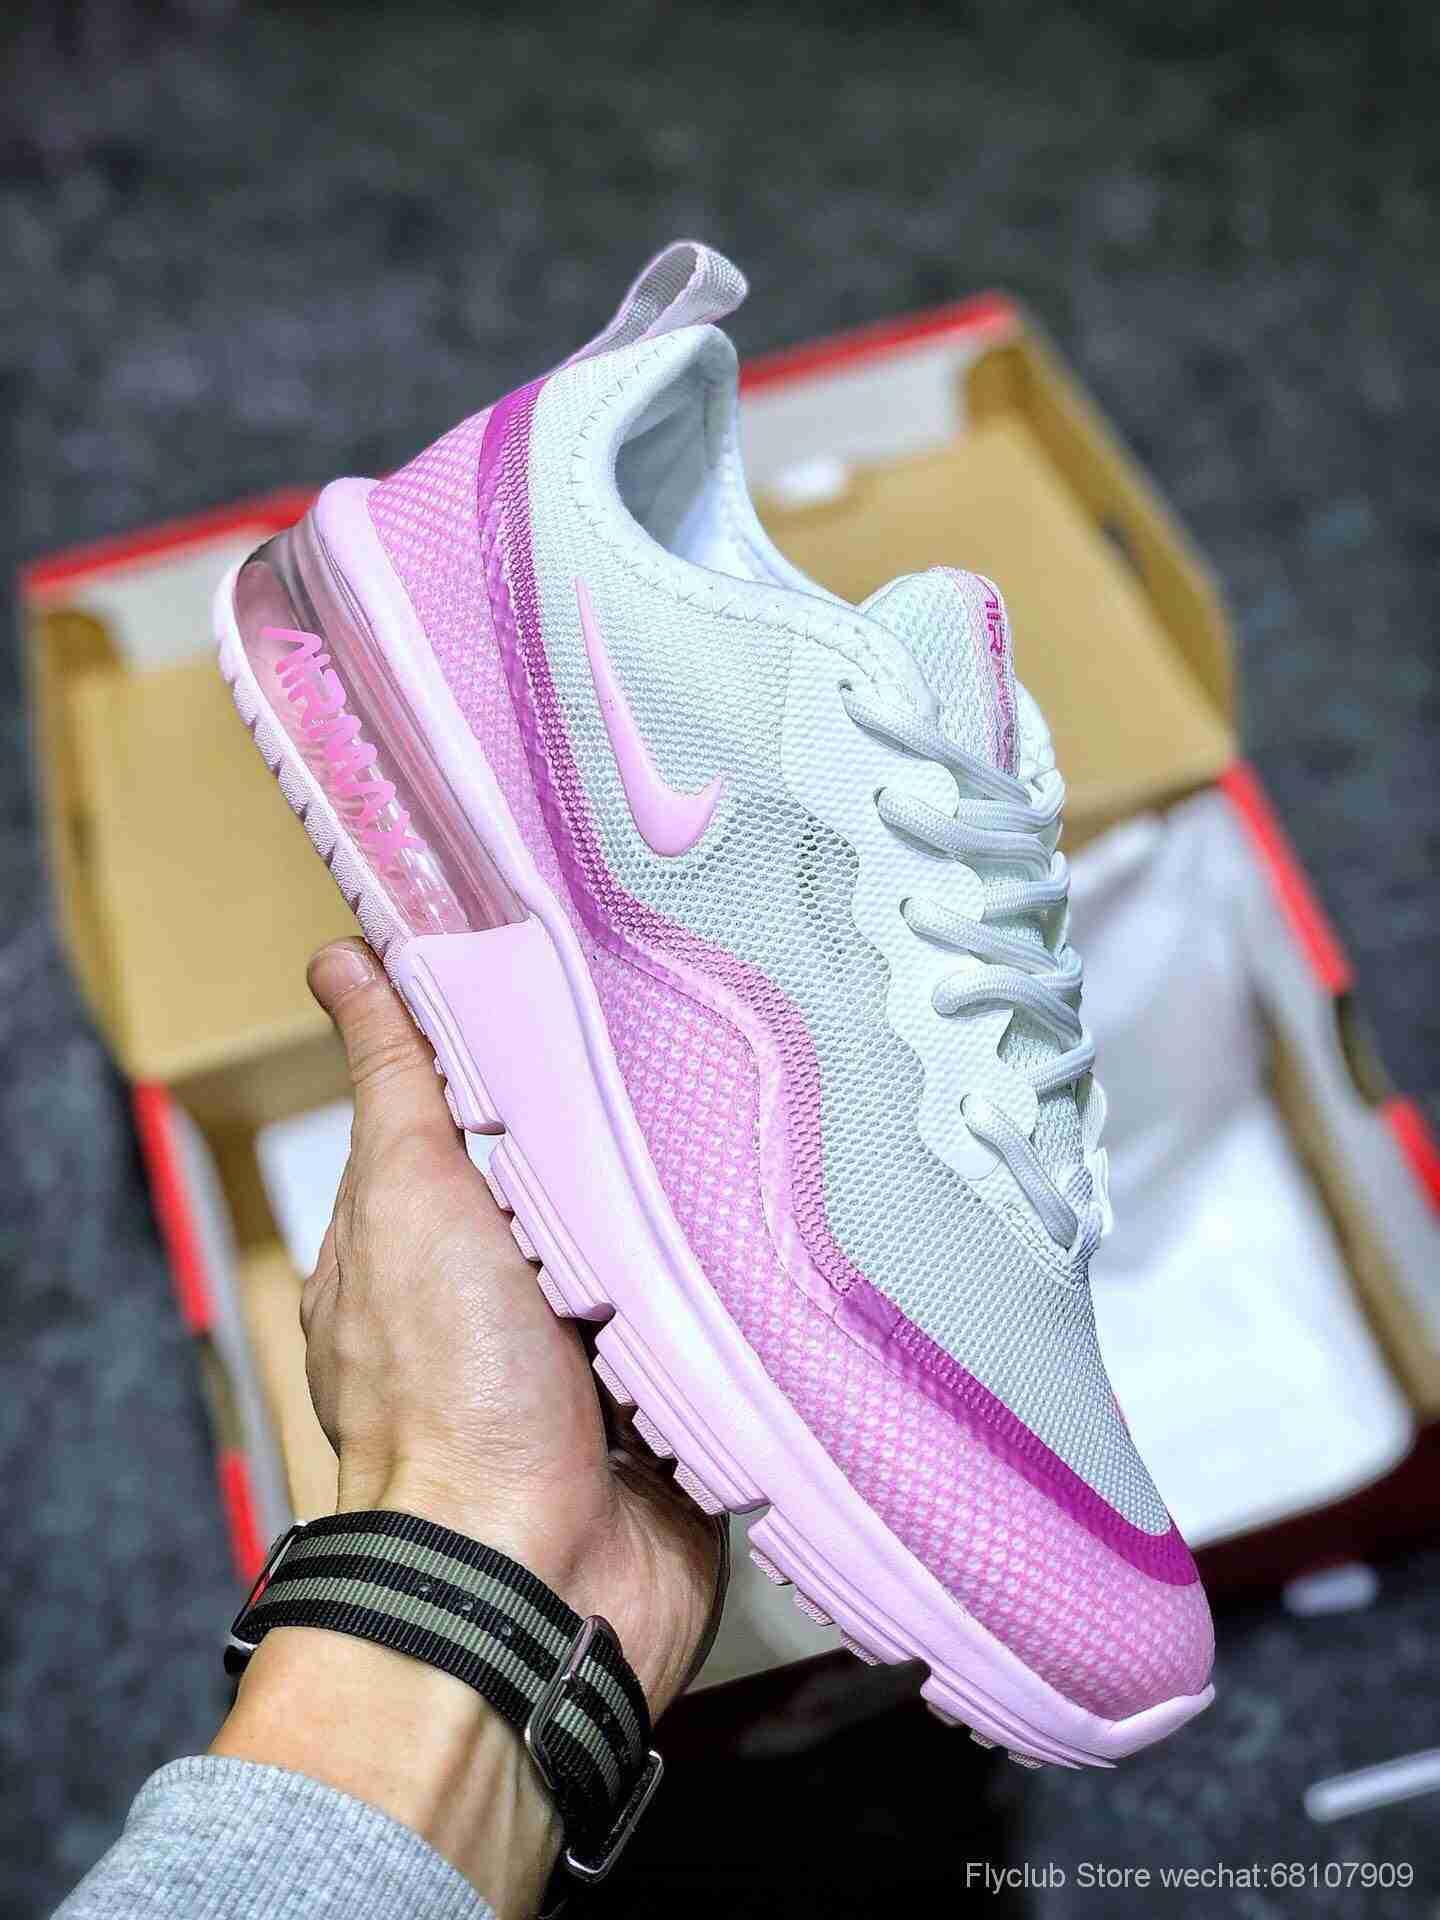 superior quality new list fresh styles Wmns Nike Air Max Sequent 半掌气垫网面透气跑步鞋BQ8825-100 ...